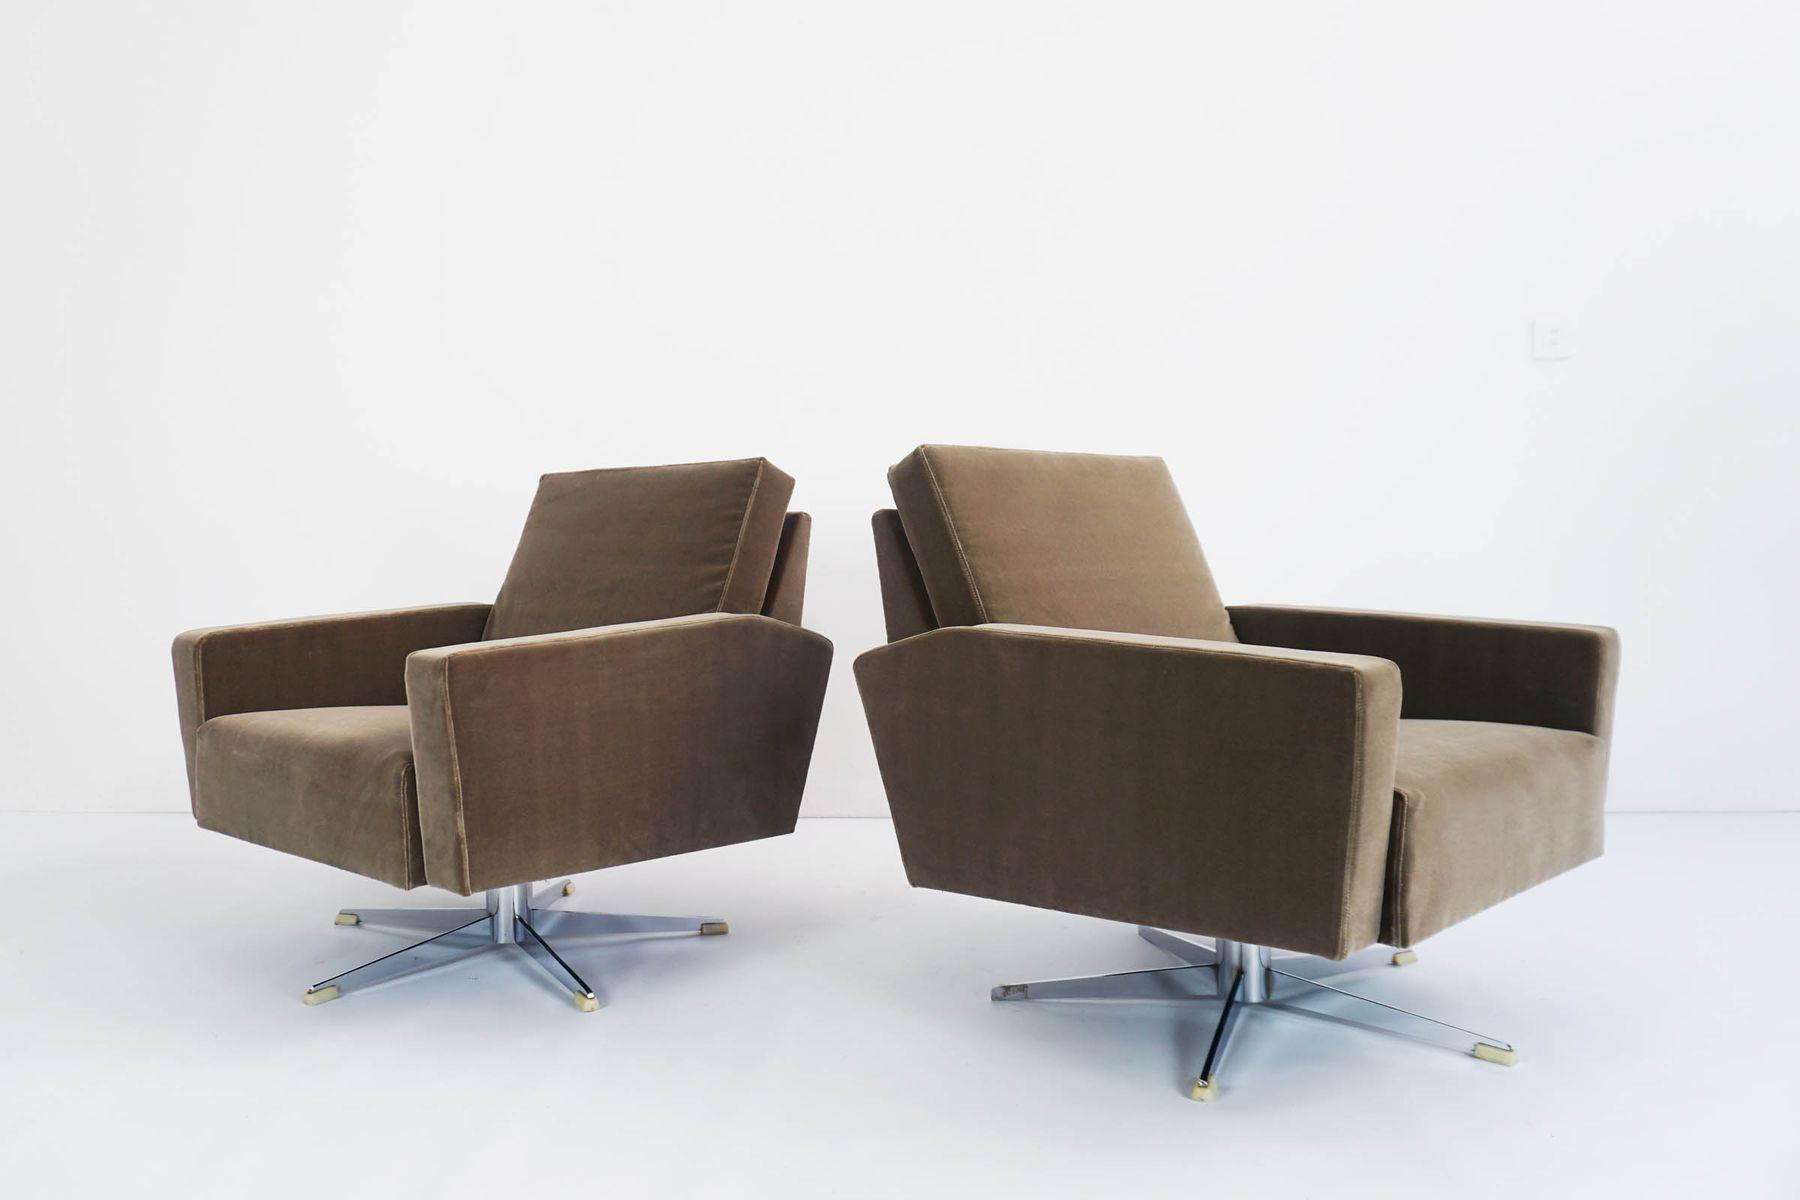 Ohrensessel Klein Relaxsessel Modern Relax Sessel Online Kaufen Schlafsessel Berlin Lounge Weisser Sessel Relaxsessel Modern Sessel Schlafsessel